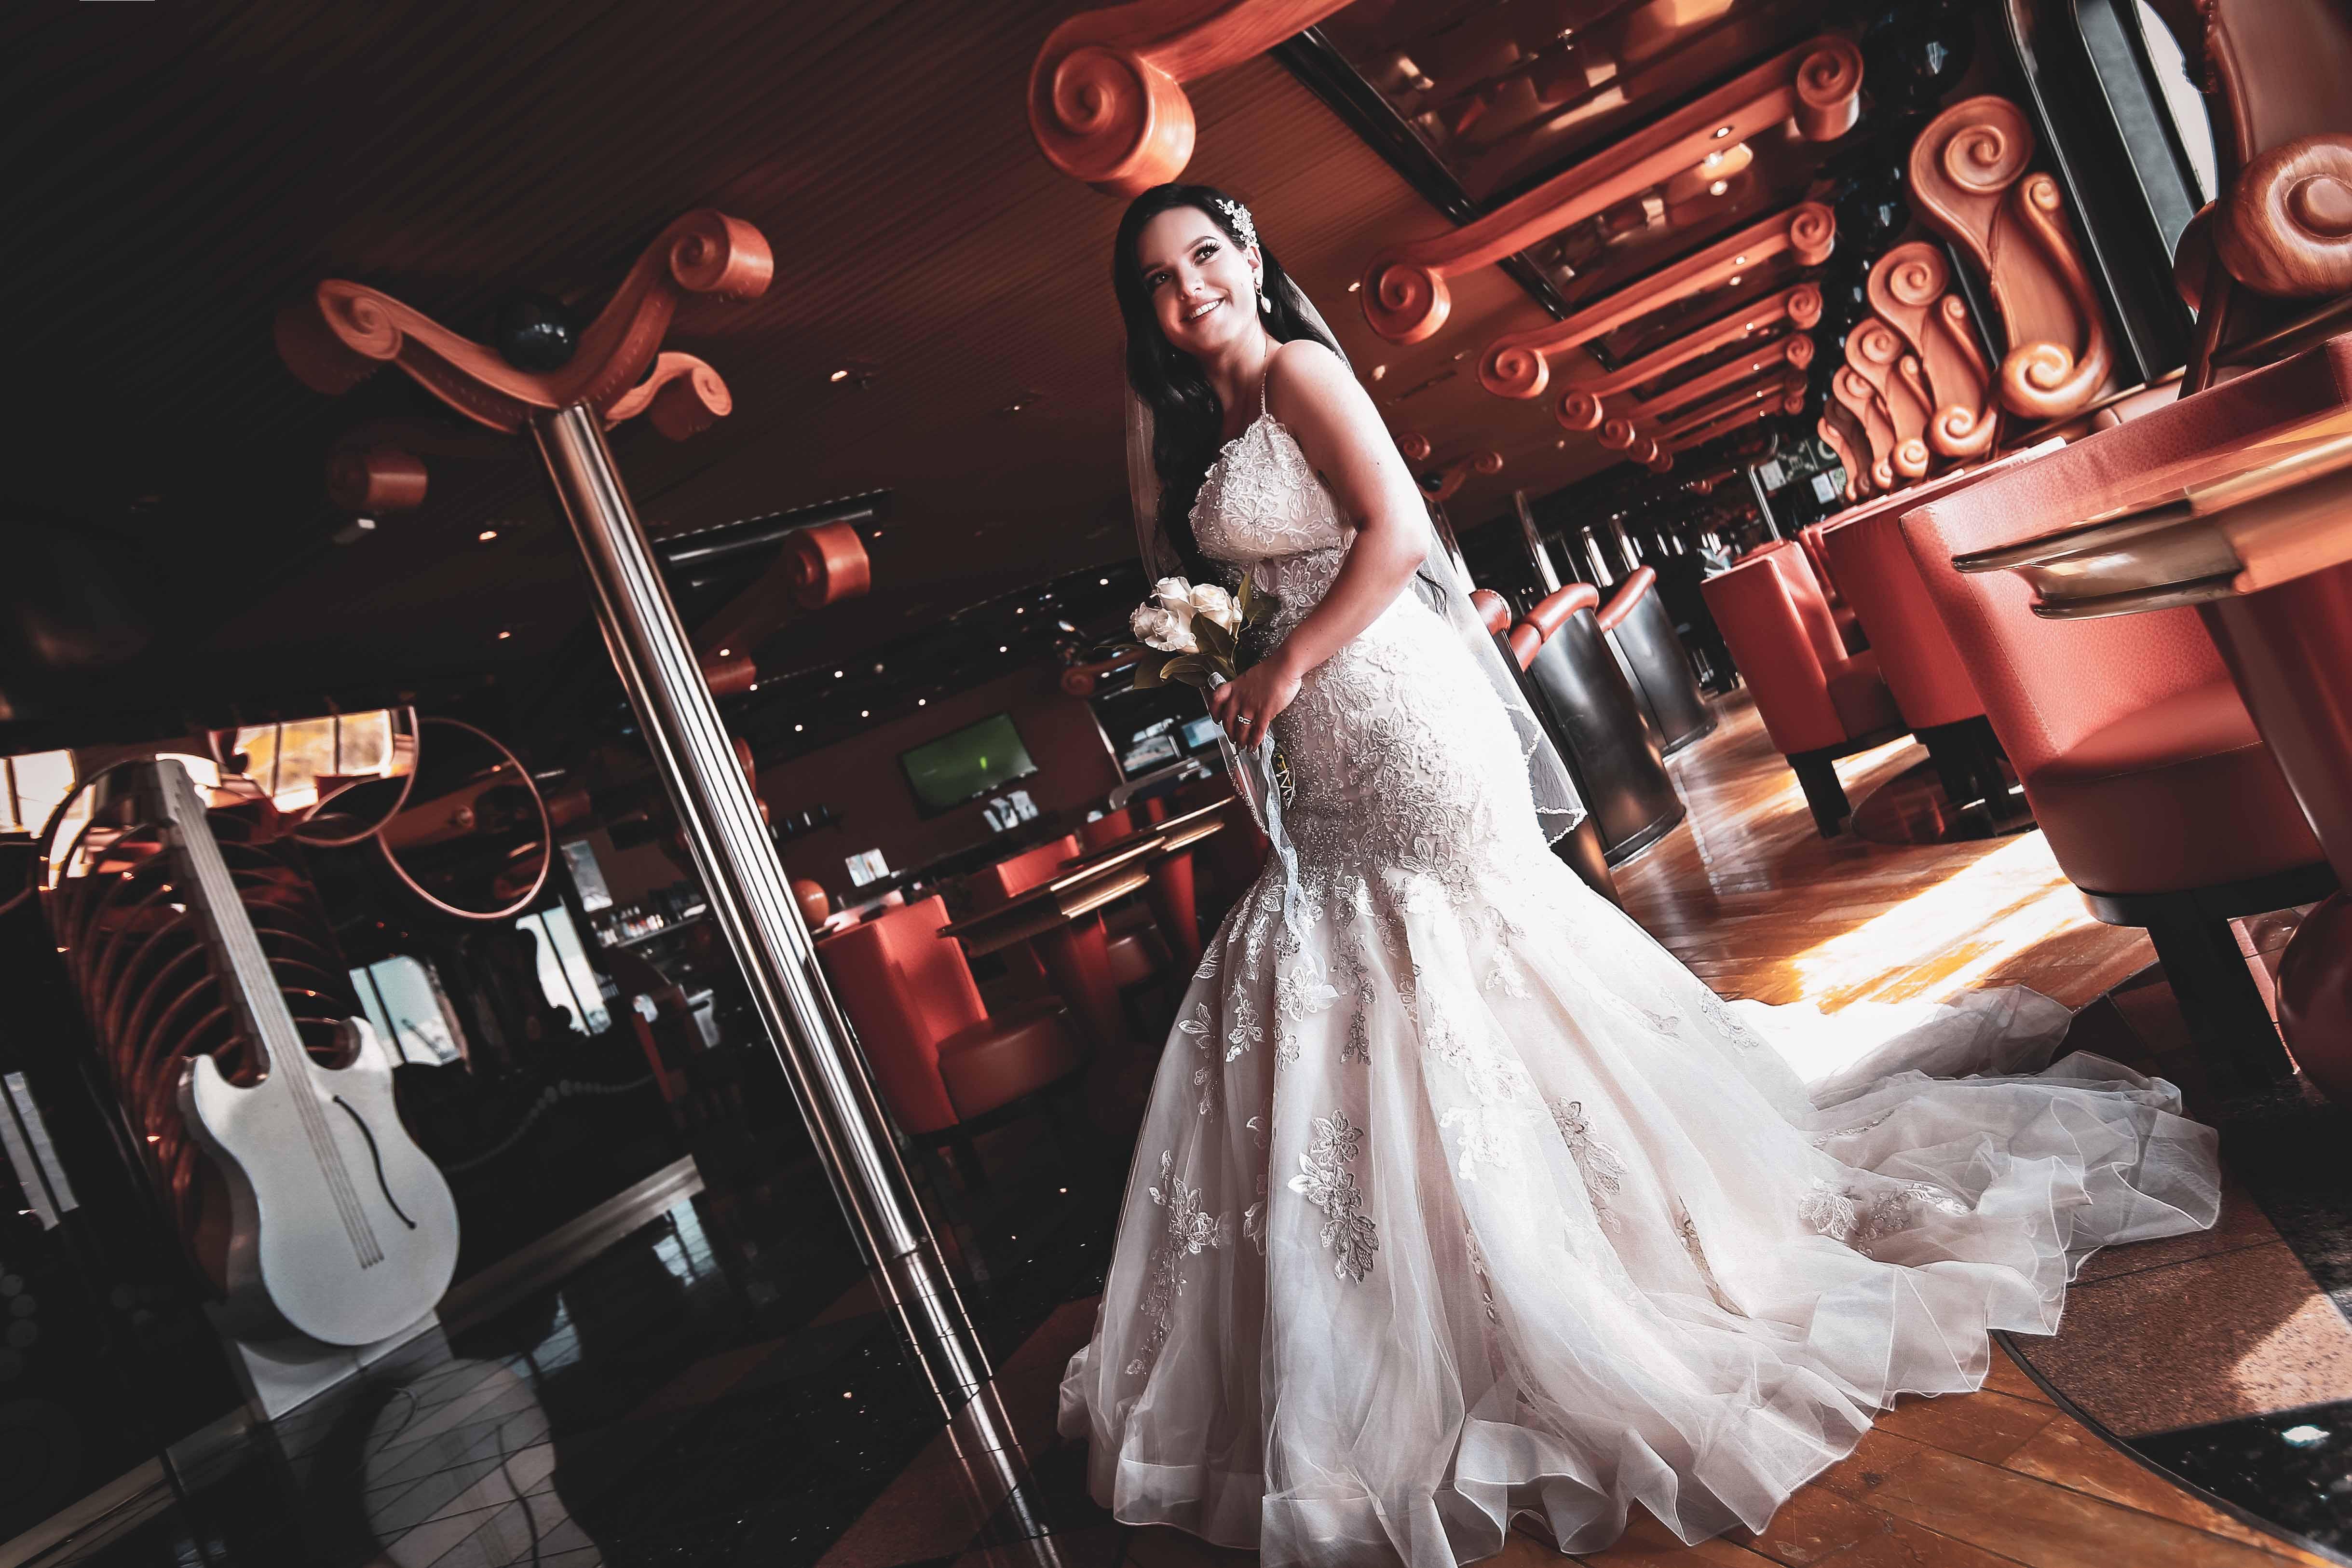 Wedding Photo shoot - Full Wedding Day